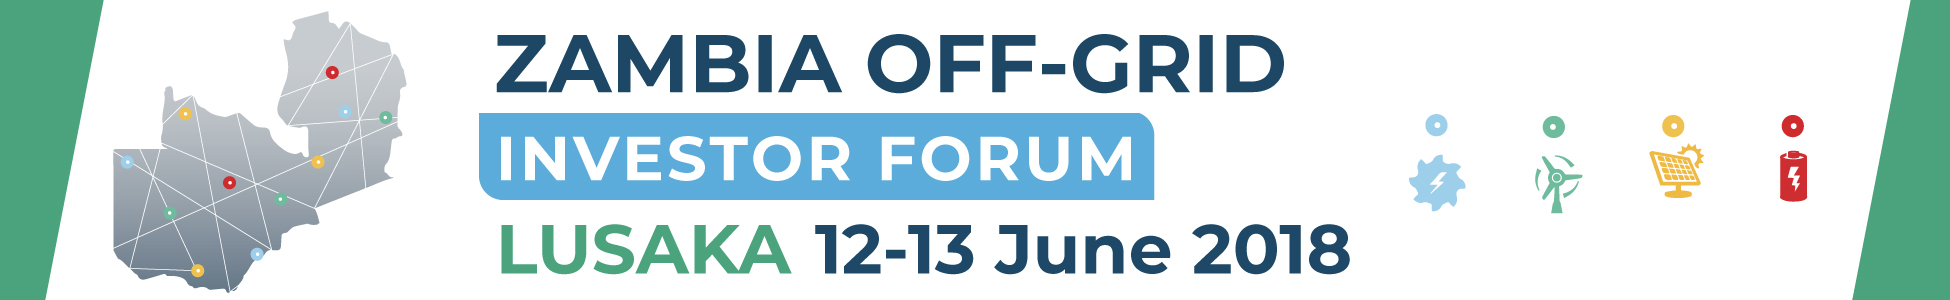 https://zambia-off-grid-investor-forum.b2match.io/